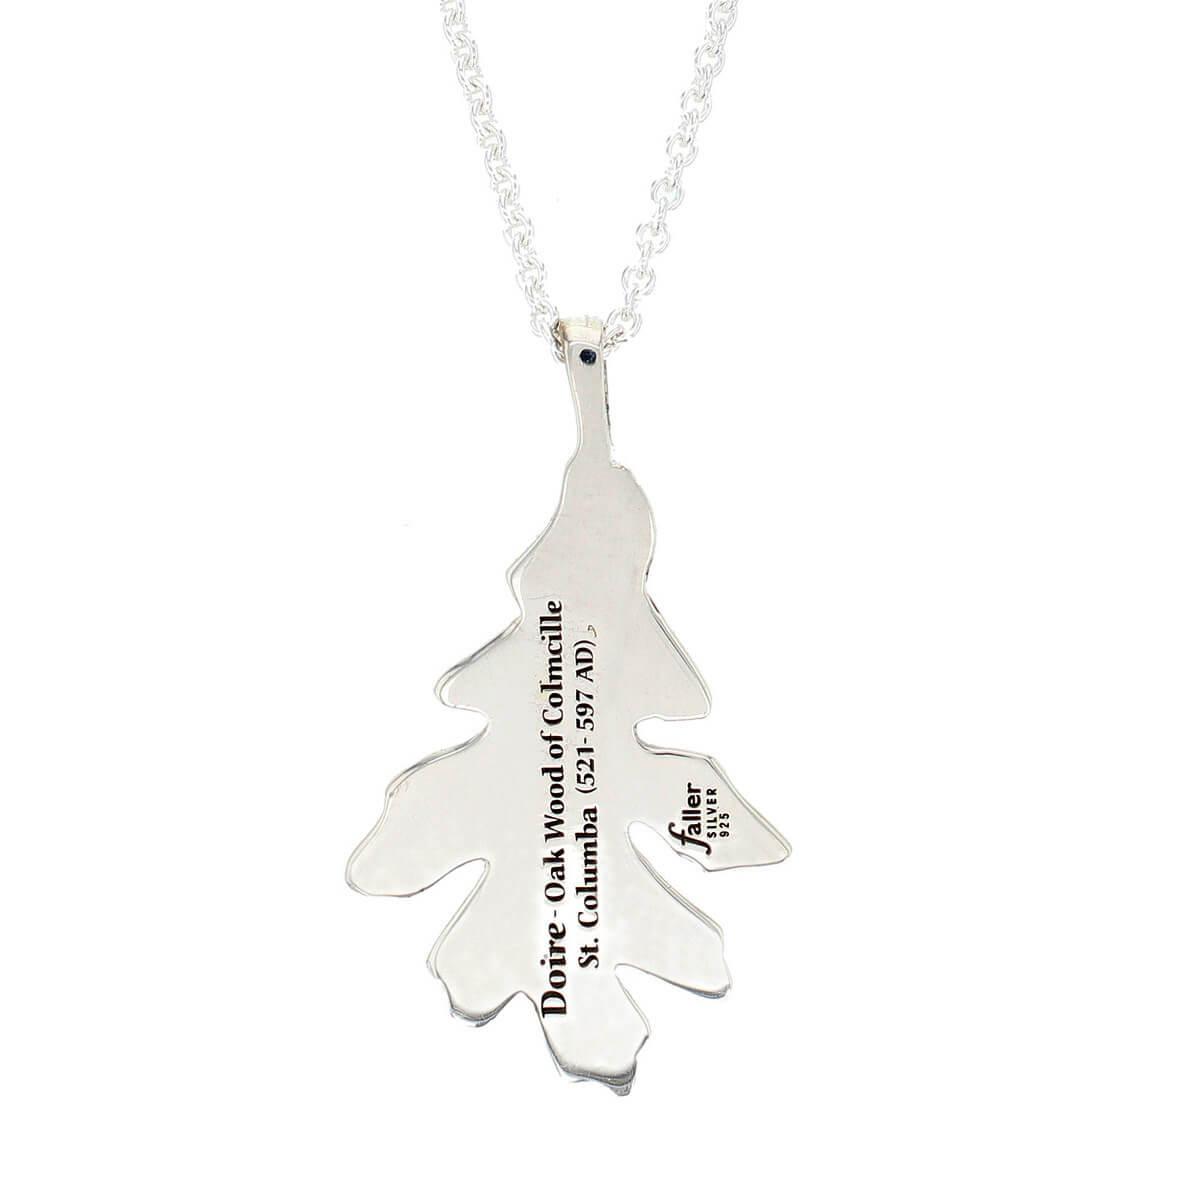 Faller Oakleaf, Derry, Londonderry, Northern Ireland, oak wood, acorn, angel, leaf, St Columba, St. Comcille, christian, heritage, historical, sterling silver pendant, engraving